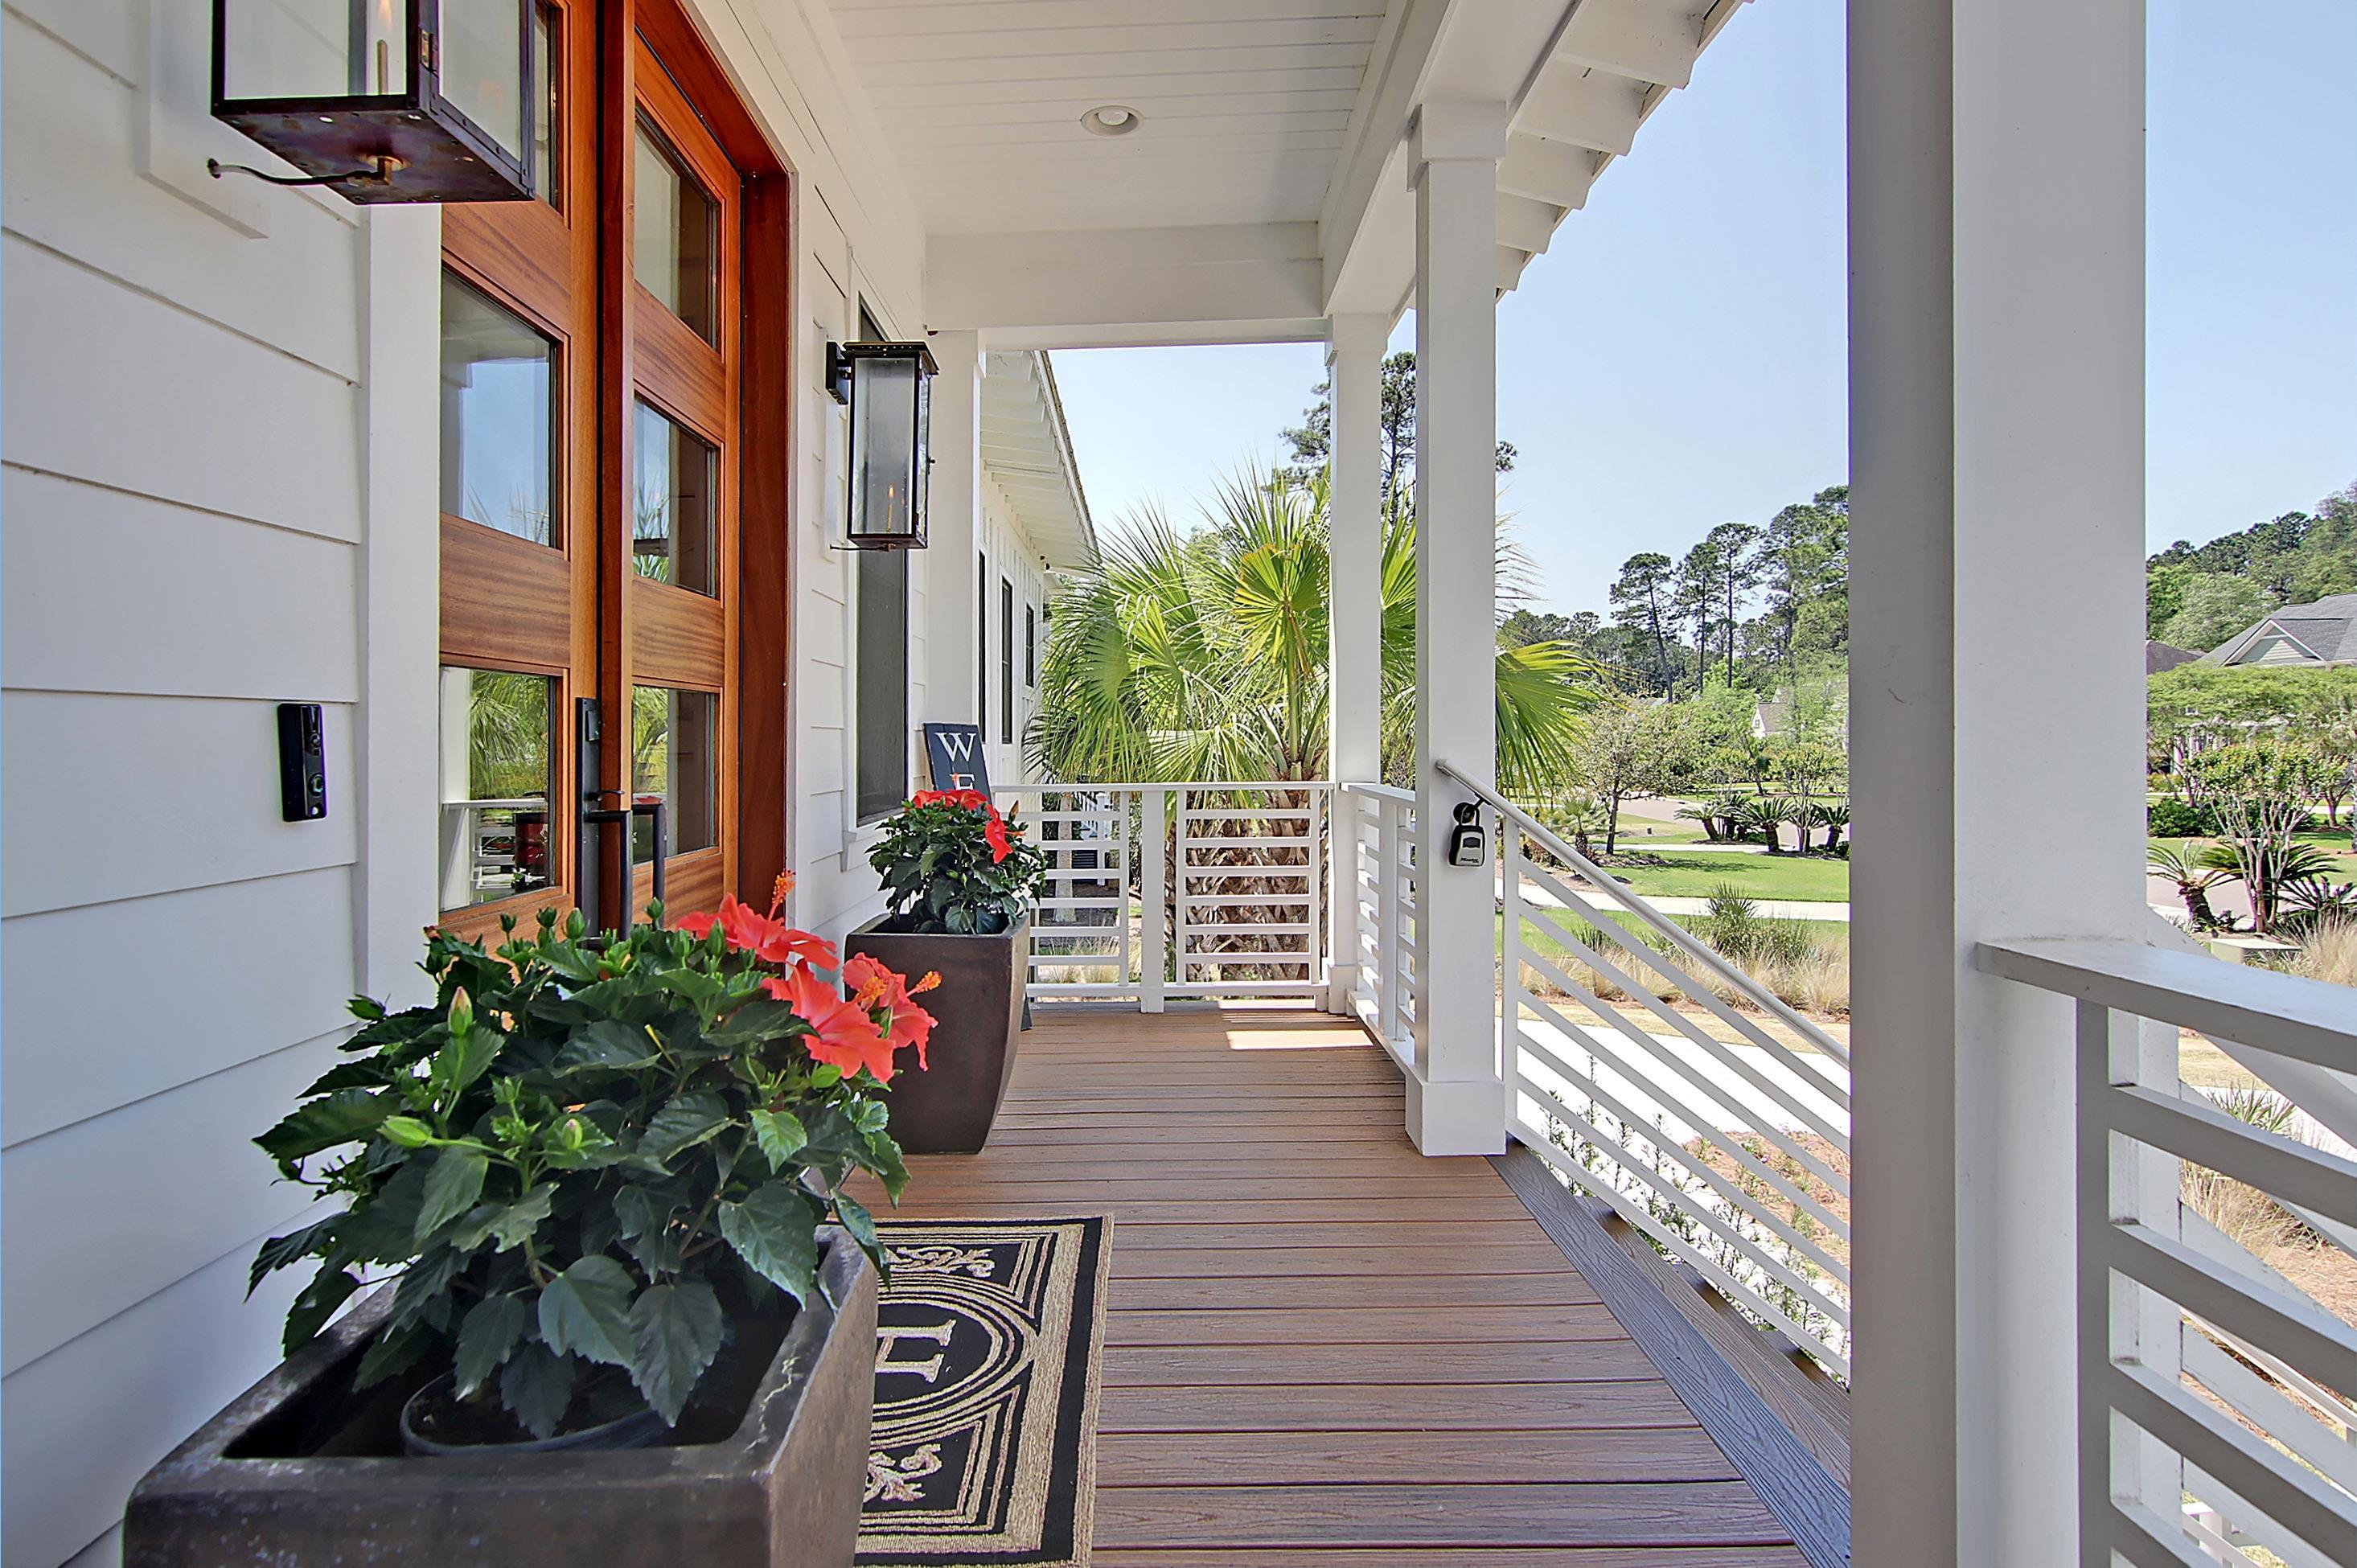 Dunes West Homes For Sale - 2456 Darts Cove, Mount Pleasant, SC - 22